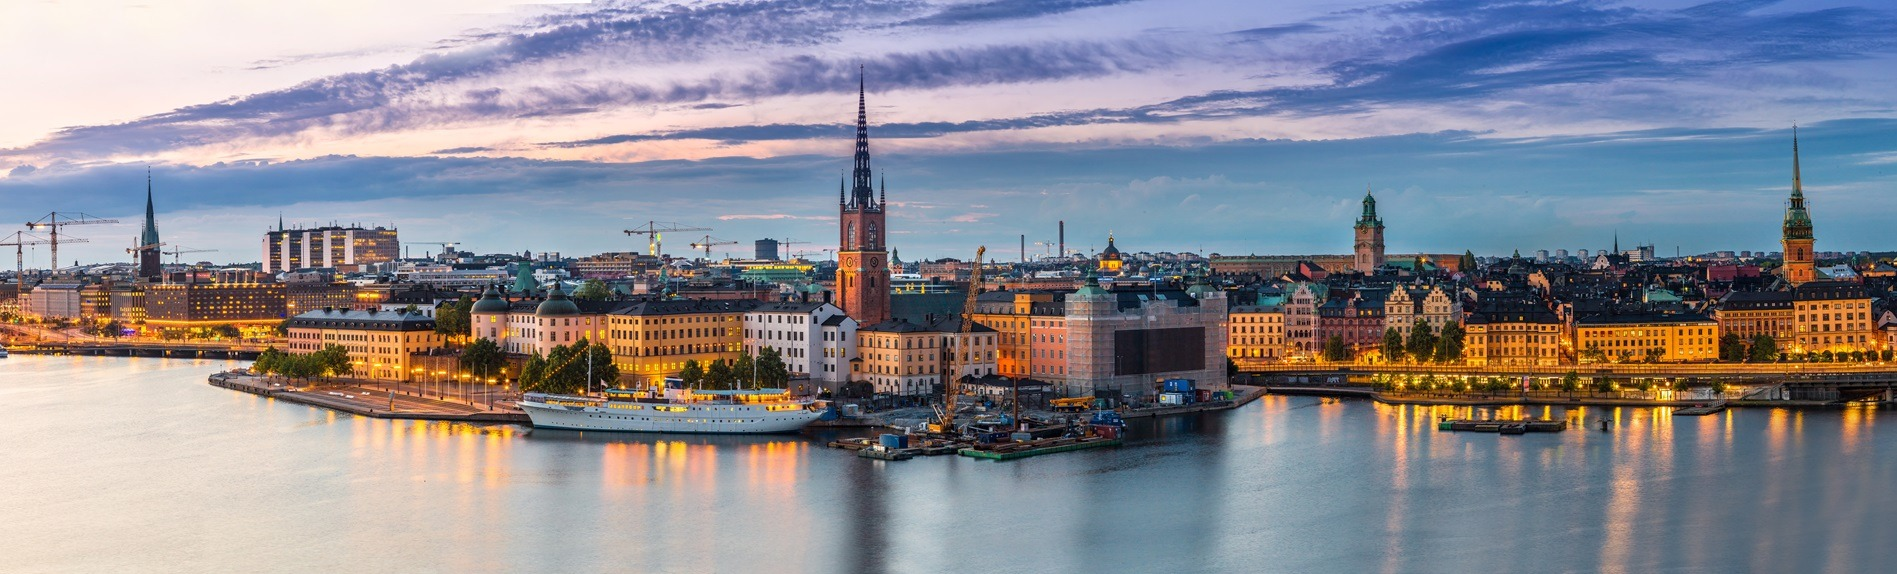 knull stockholm city stockholm